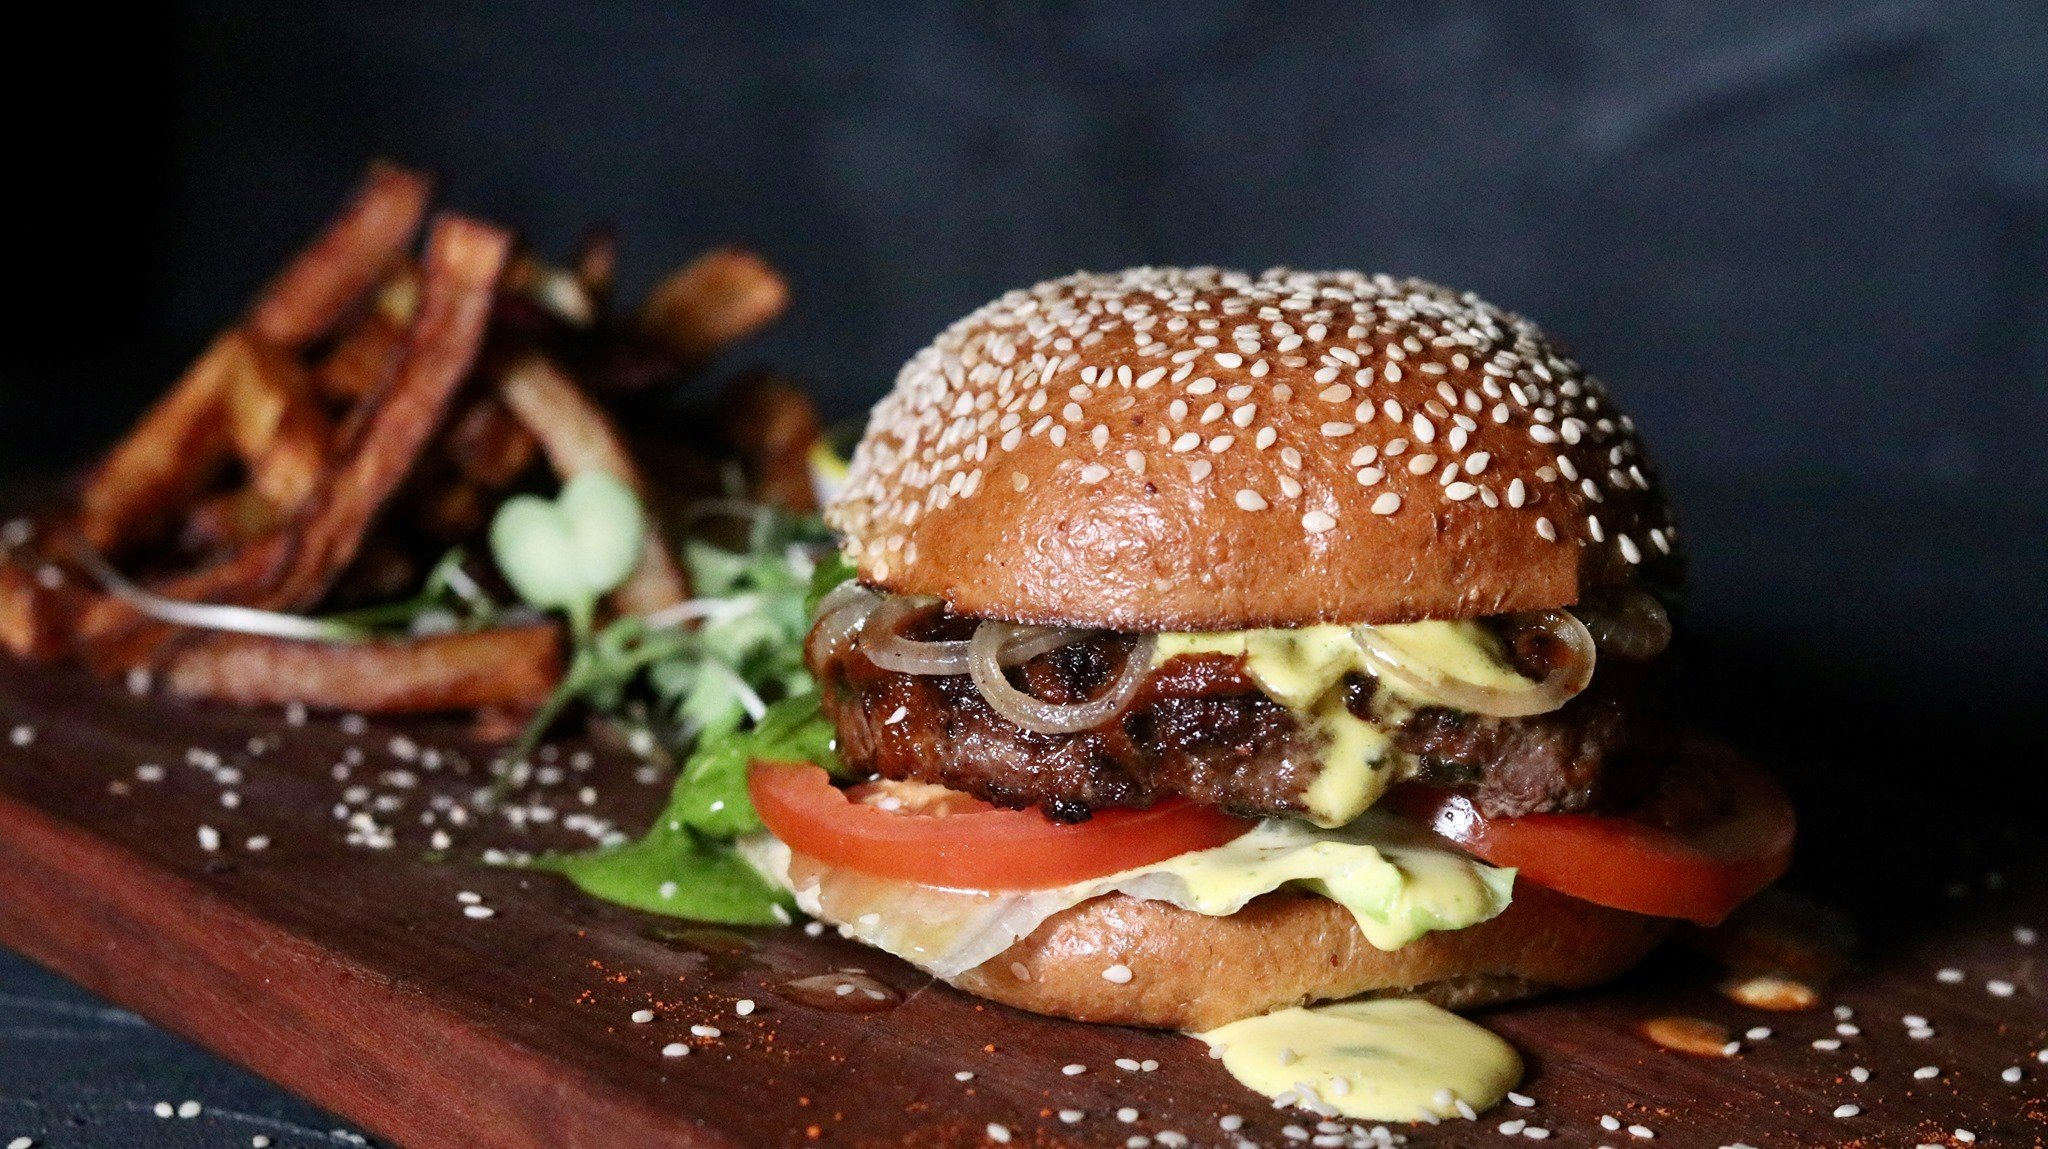 Clenergy Halal Halaal Burger Johannesburg South Africa